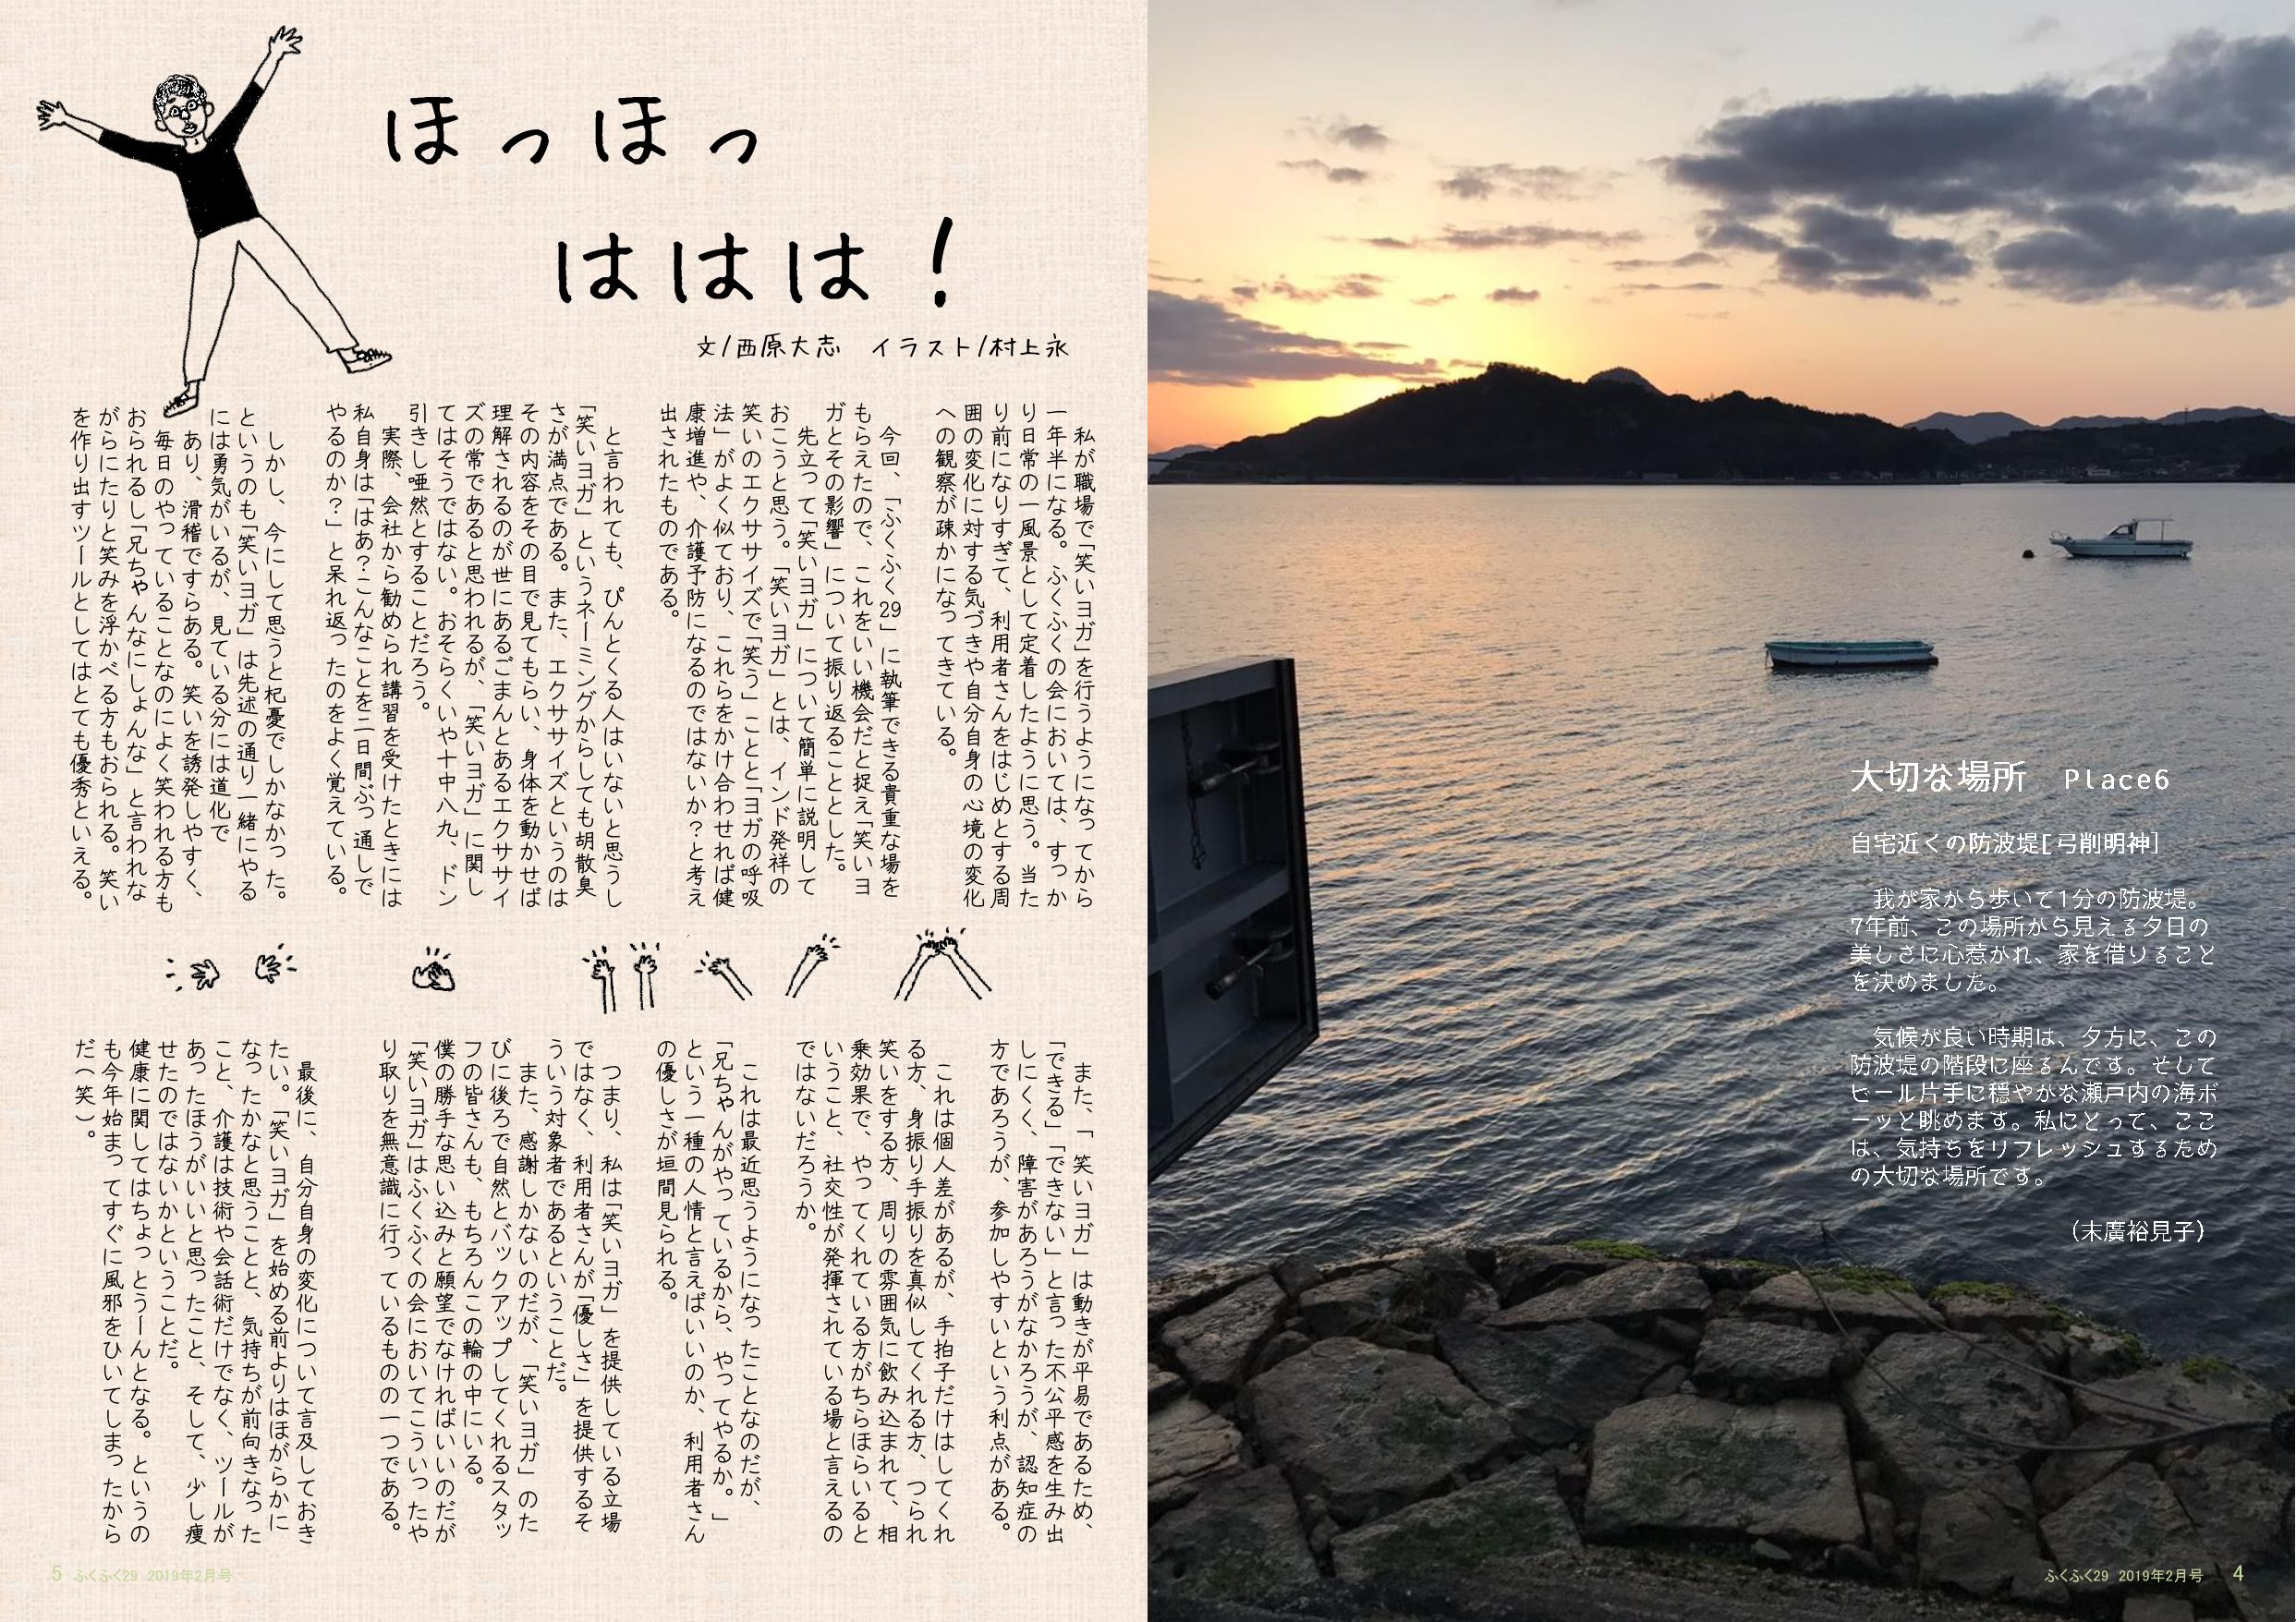 http://fukufukunokai.com/newsletter/images/%E3%81%B5%E3%81%8F%E3%81%B5%E3%81%8F29%E3%80%802019%E3%80%802%E6%9C%88%E5%8F%B7_cropped_3.jpeg